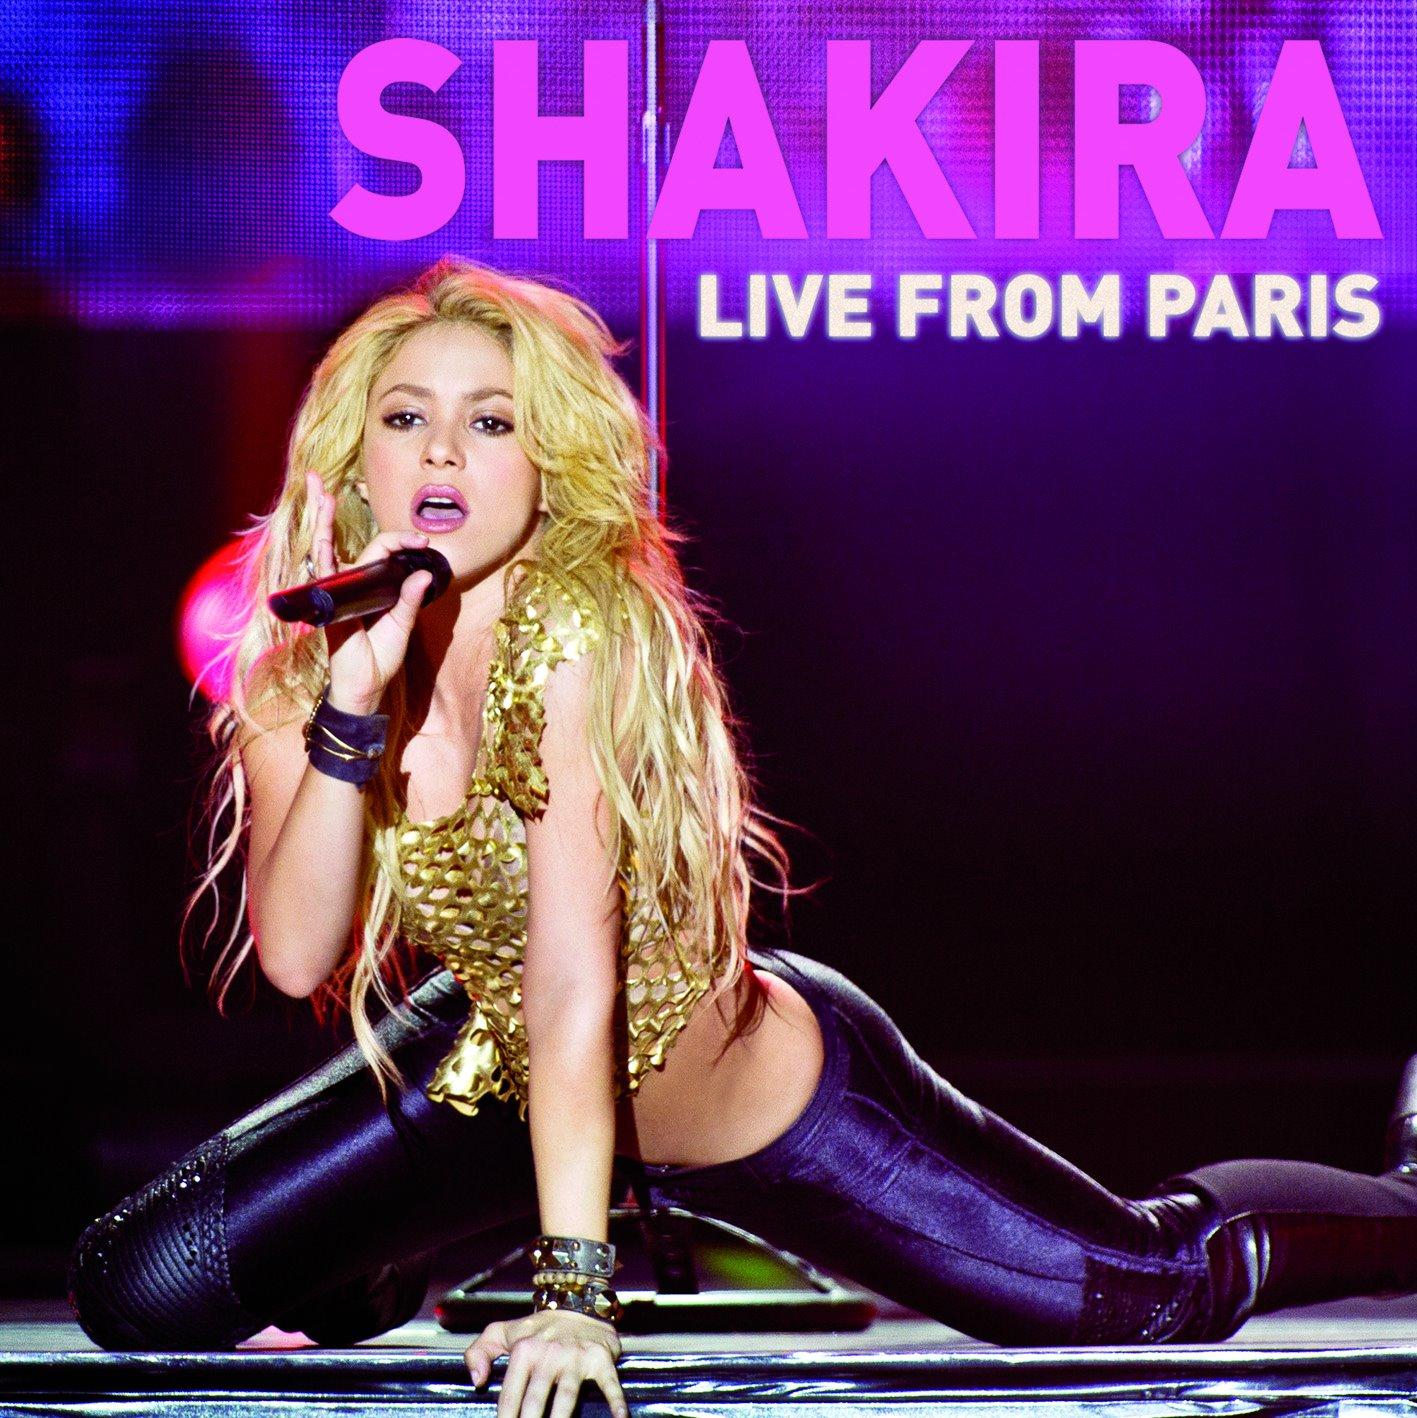 http://4.bp.blogspot.com/-HFM5pJQuRSw/UDf4F_auR8I/AAAAAAAAAQg/lve0W07FagI/s1600/shakira-en-live-paris-HQ-myshakiblog.jpg